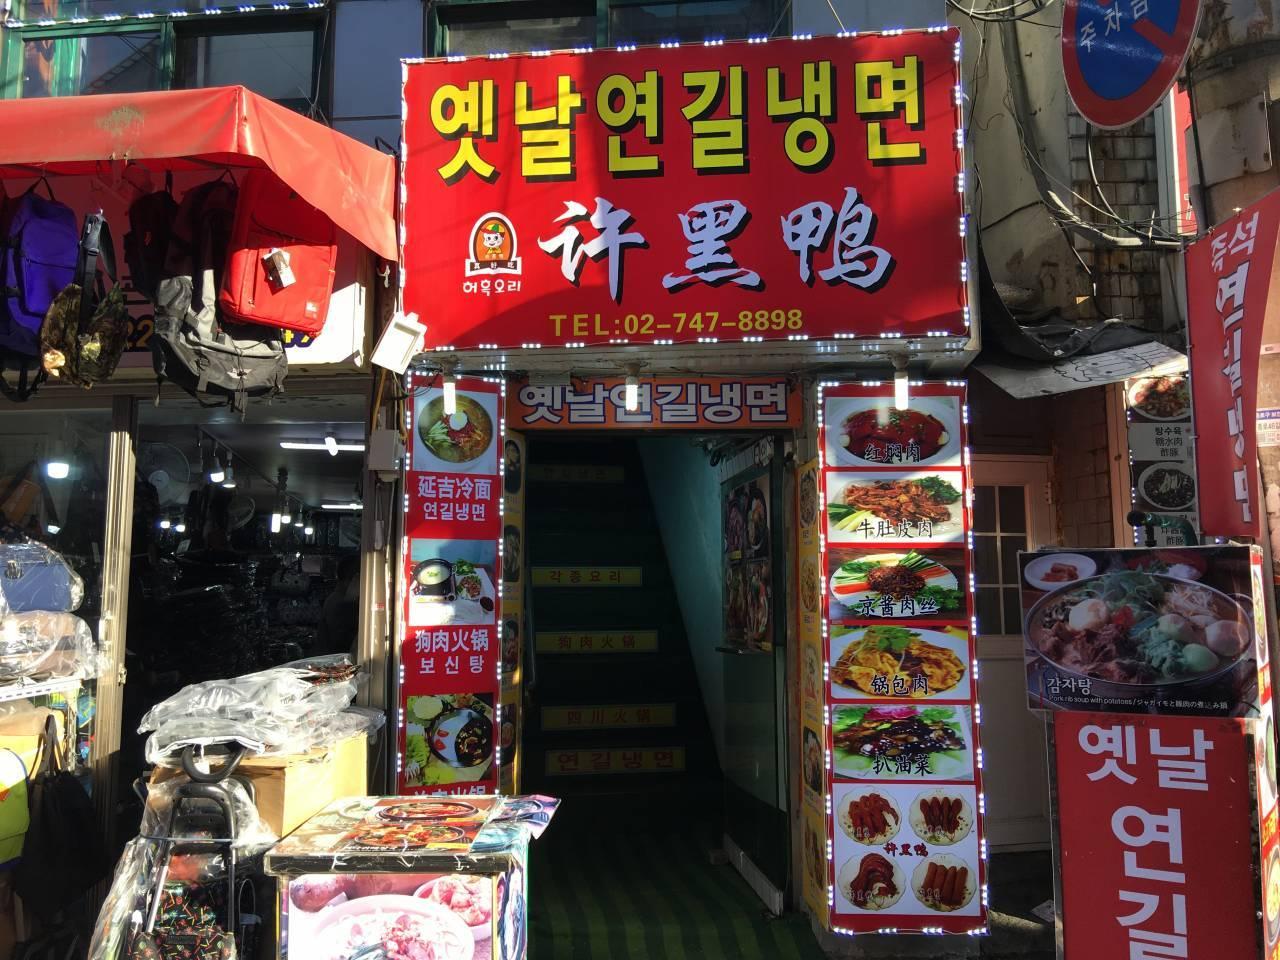 Yennal Yeongil Naengmyeon(옛날연길냉면)